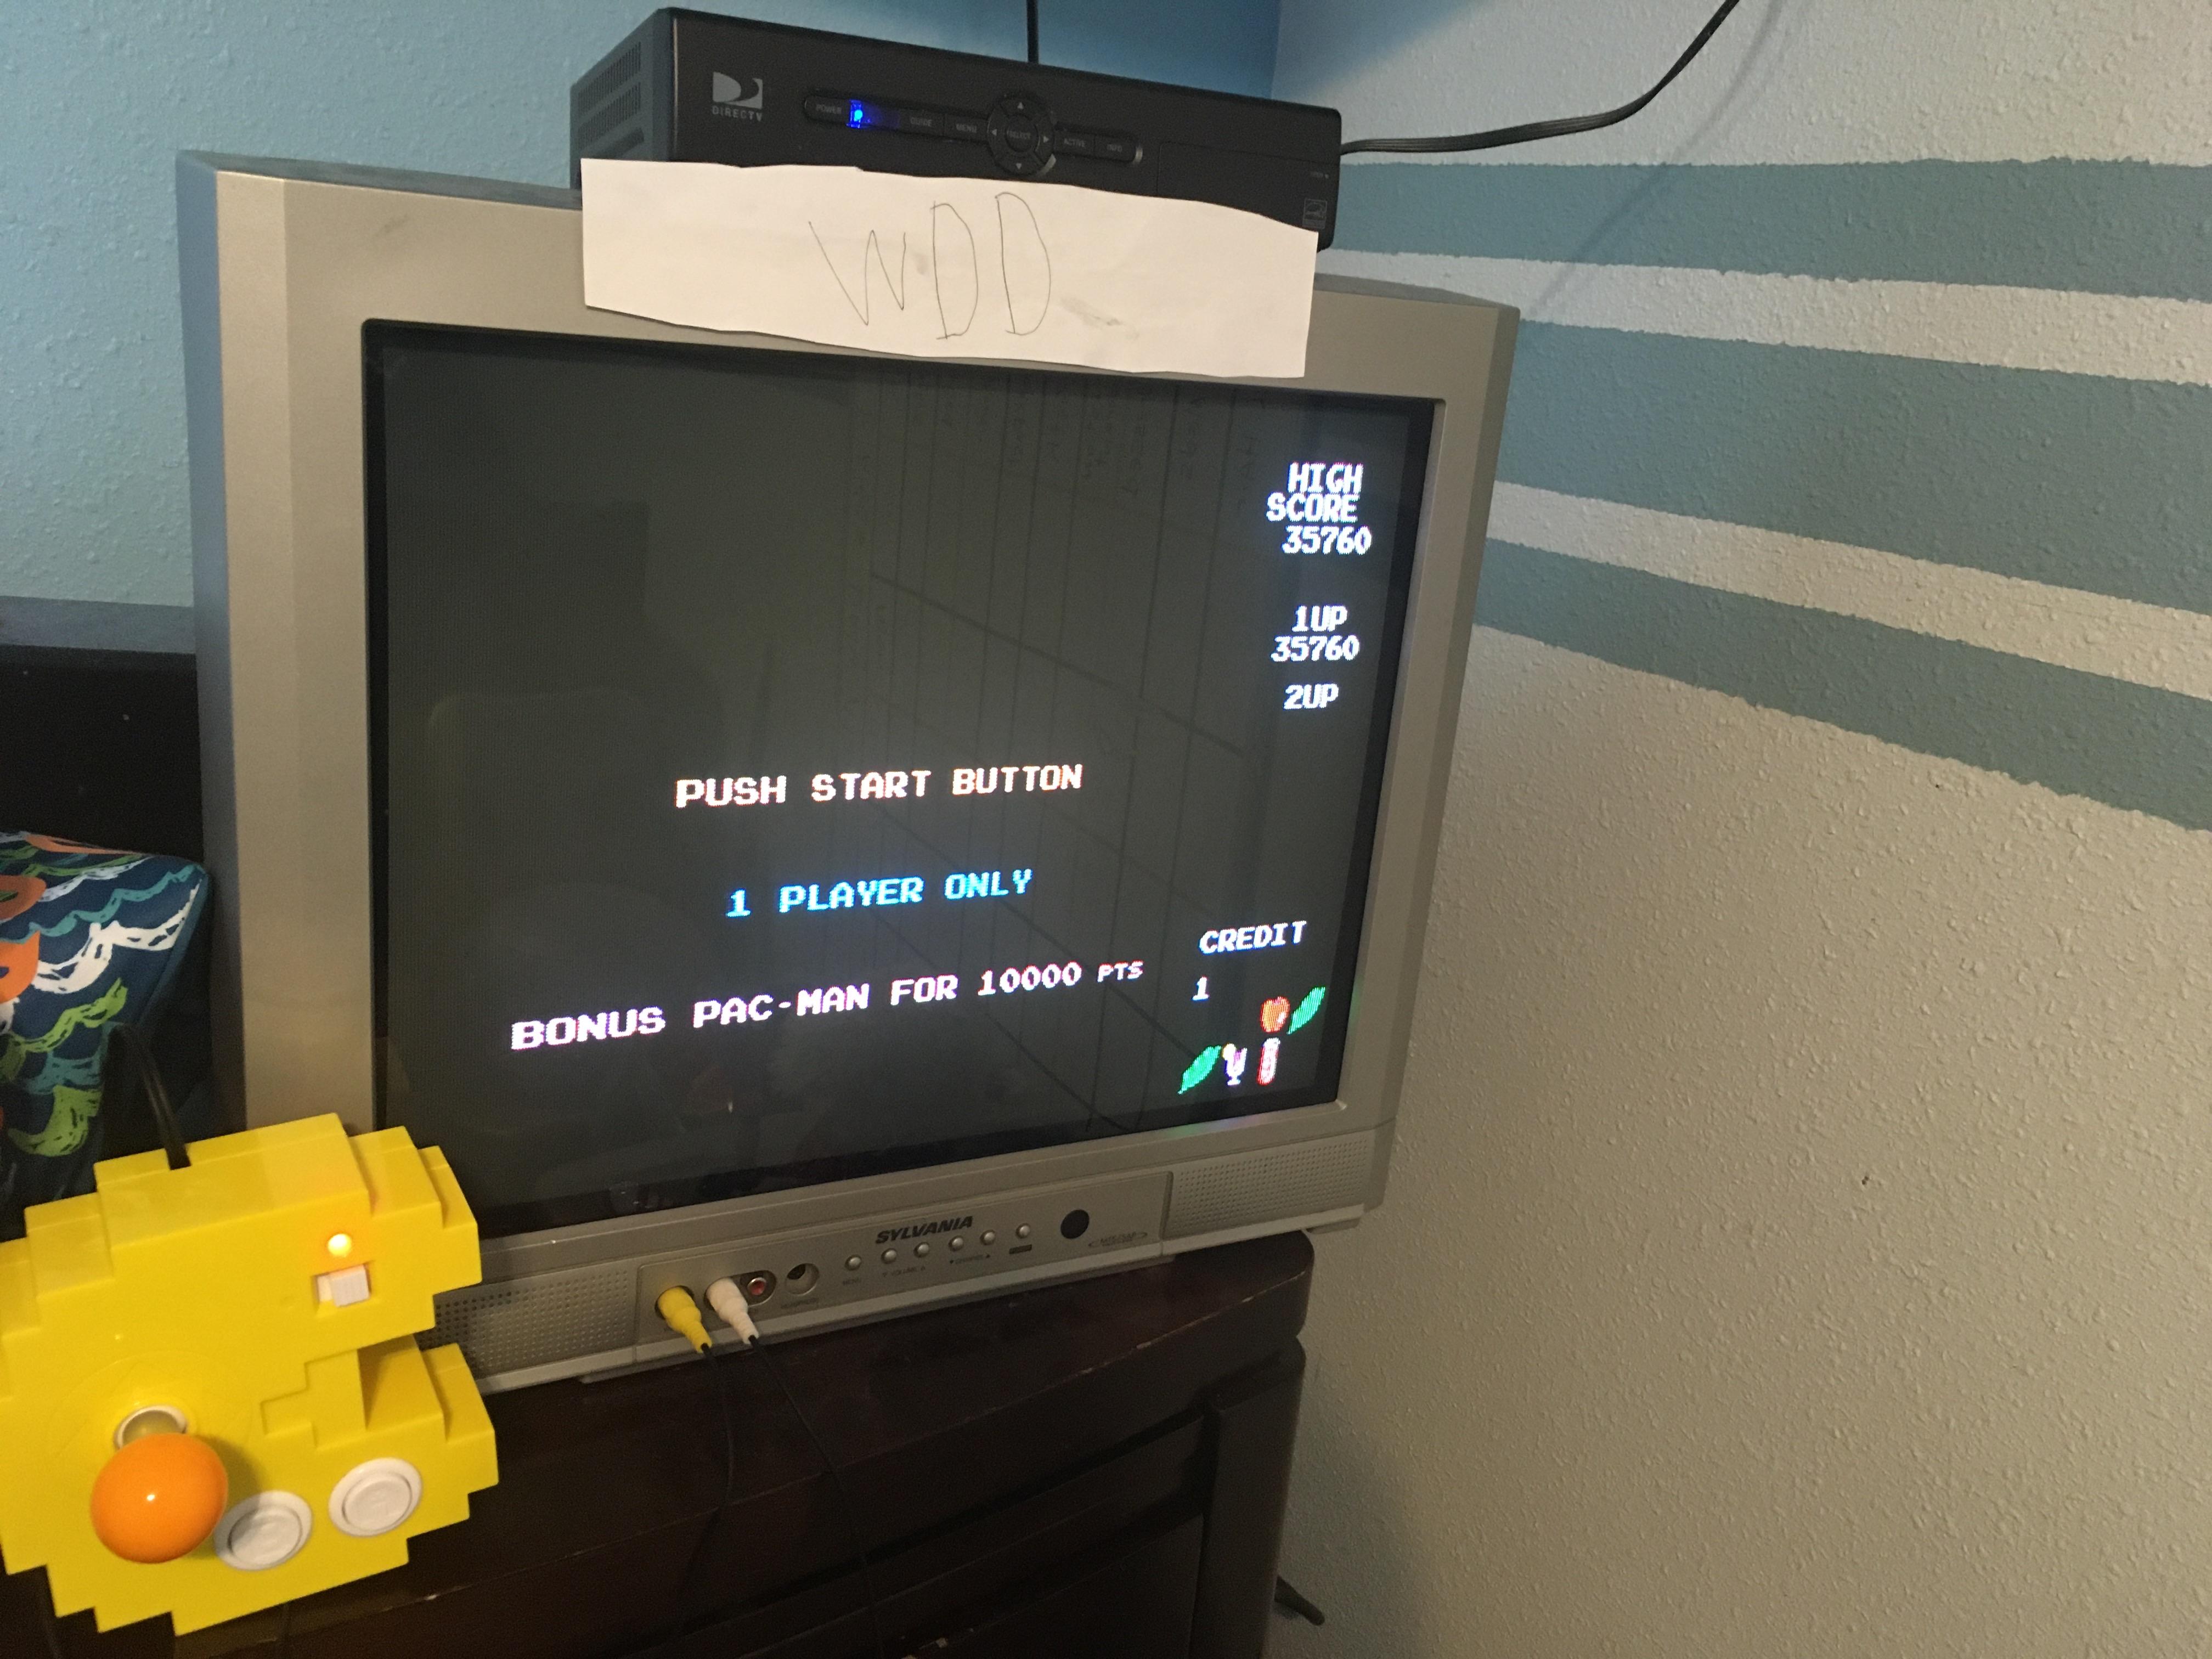 Pac-man Plus 35,760 points